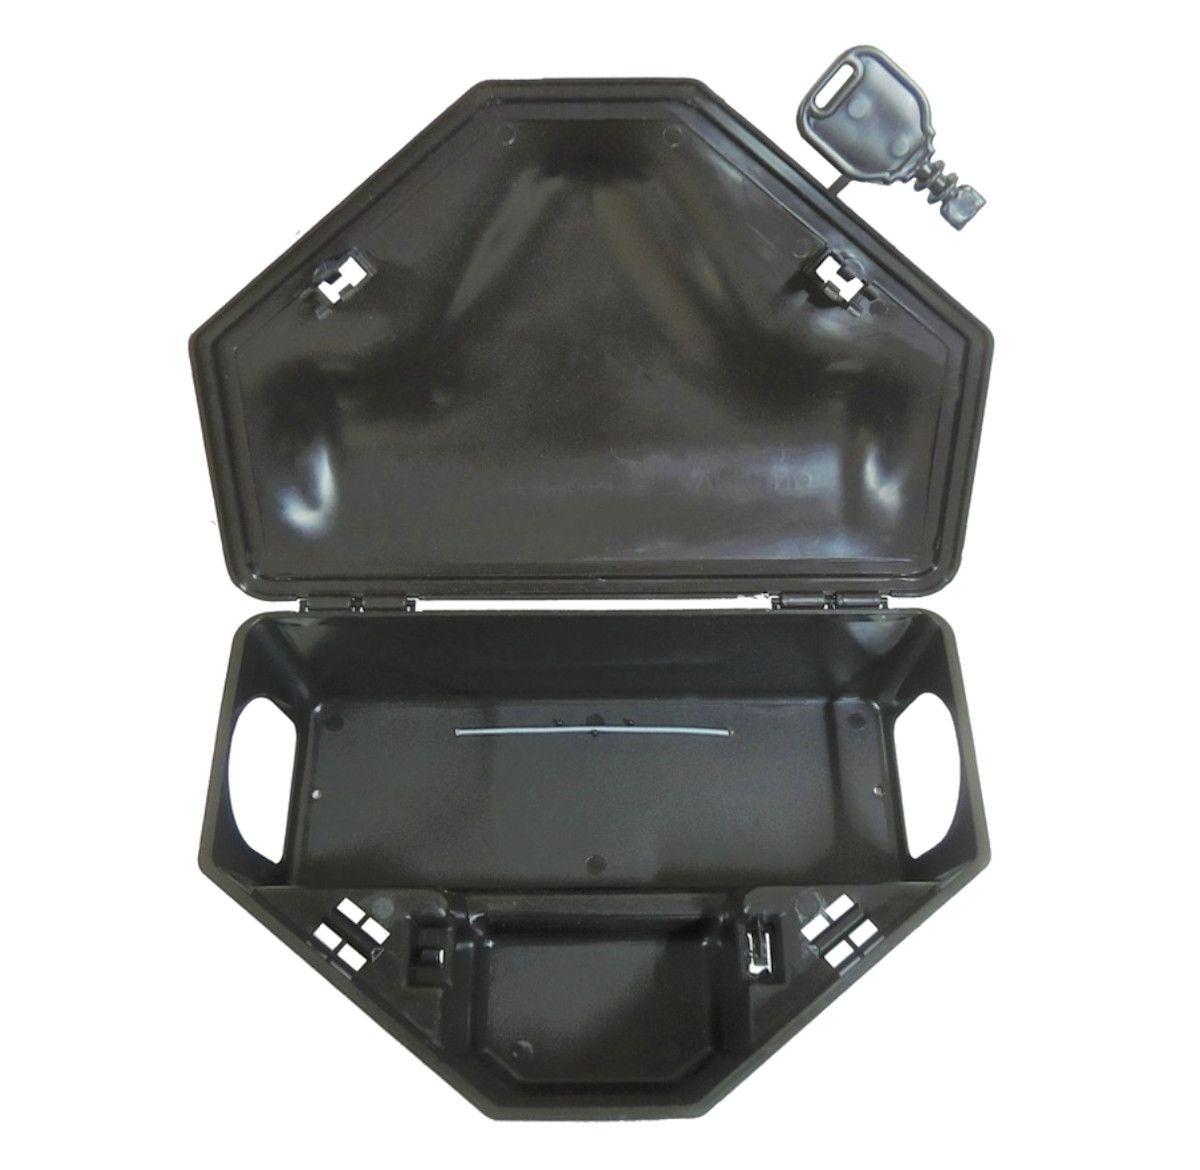 Kit 50 Porta Isca Com 2 Chaves - Duplo Travamento